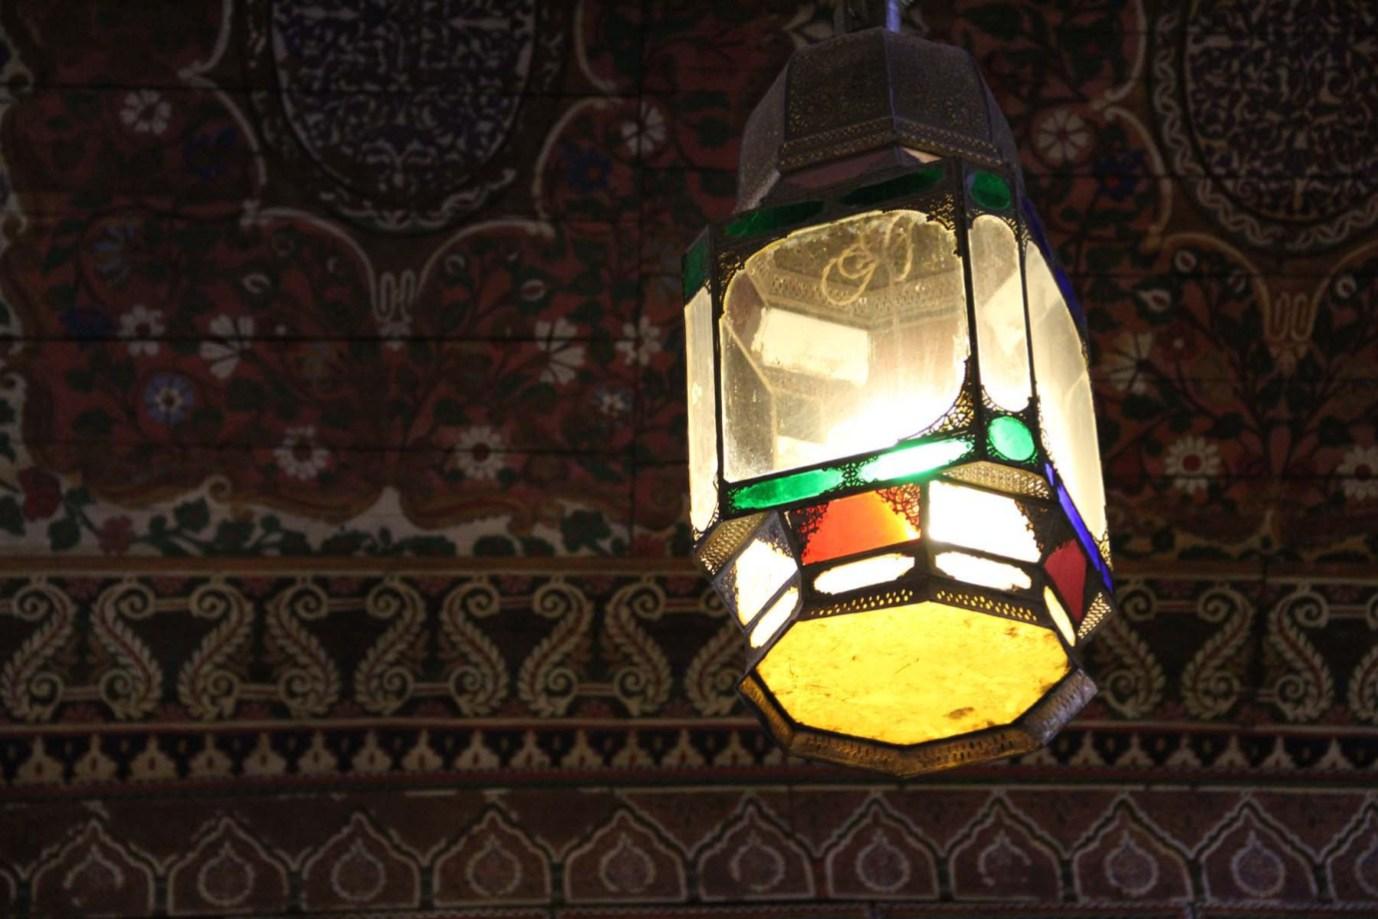 Lamp in Bahia Palace, Marrakech